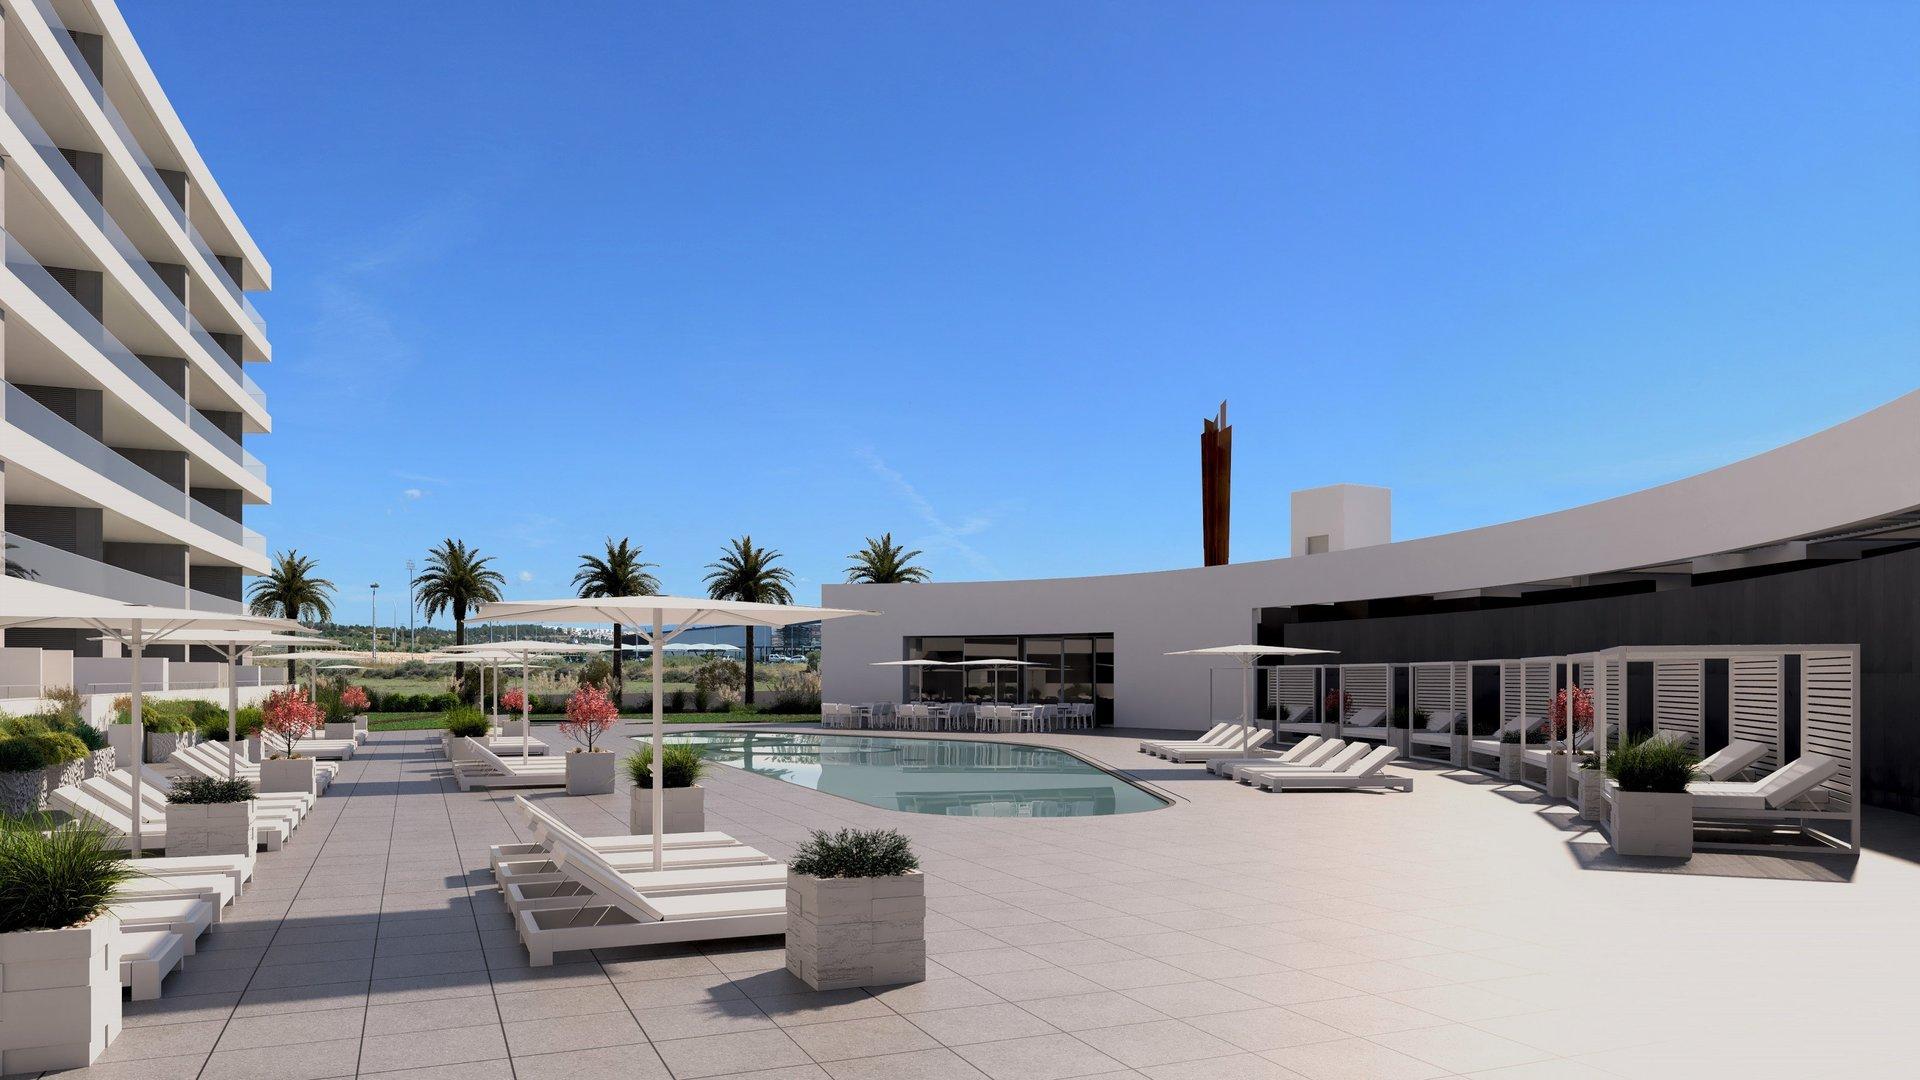 3 Bedroom Apartment Lagos, Western Algarve Ref: GA412B